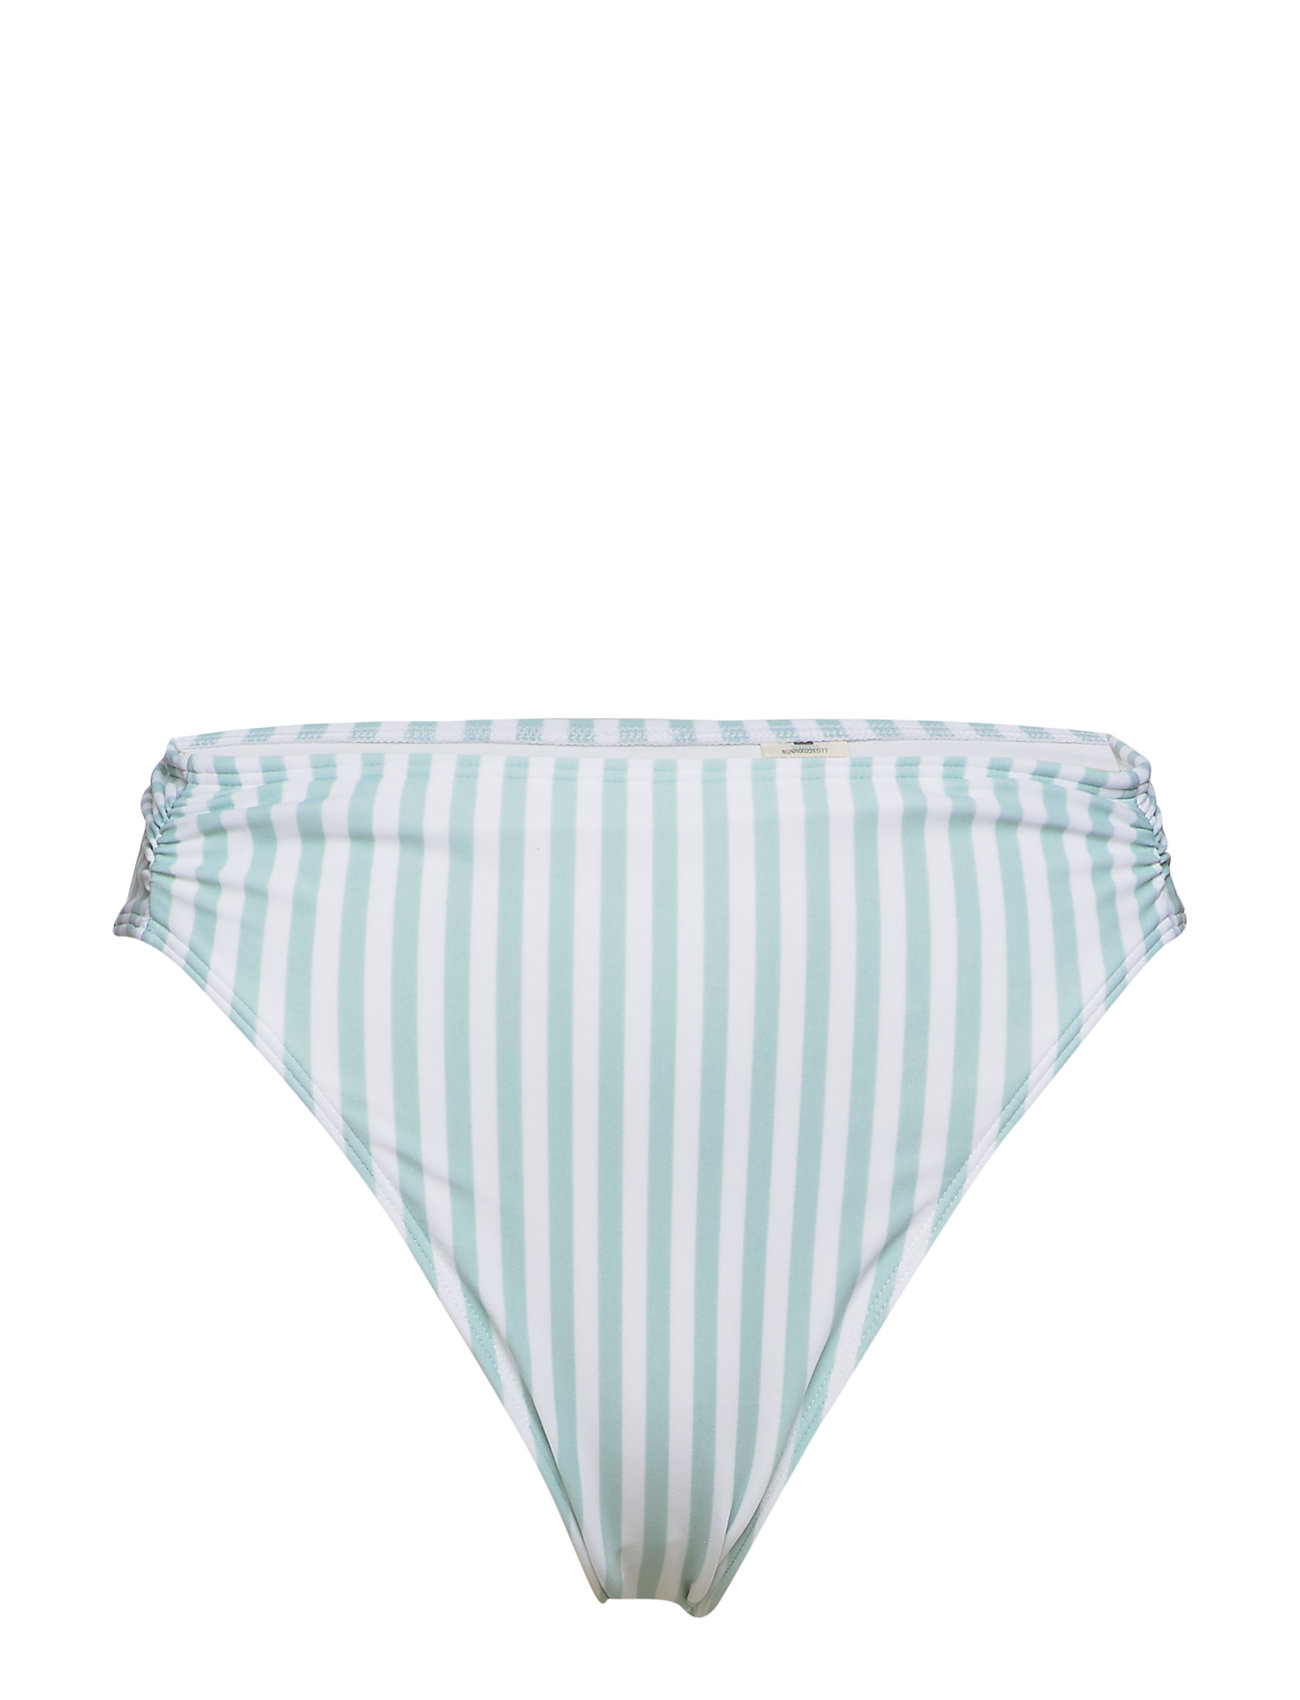 Image of Swimwear Bikinitrusser Blå Hollister (3369205995)